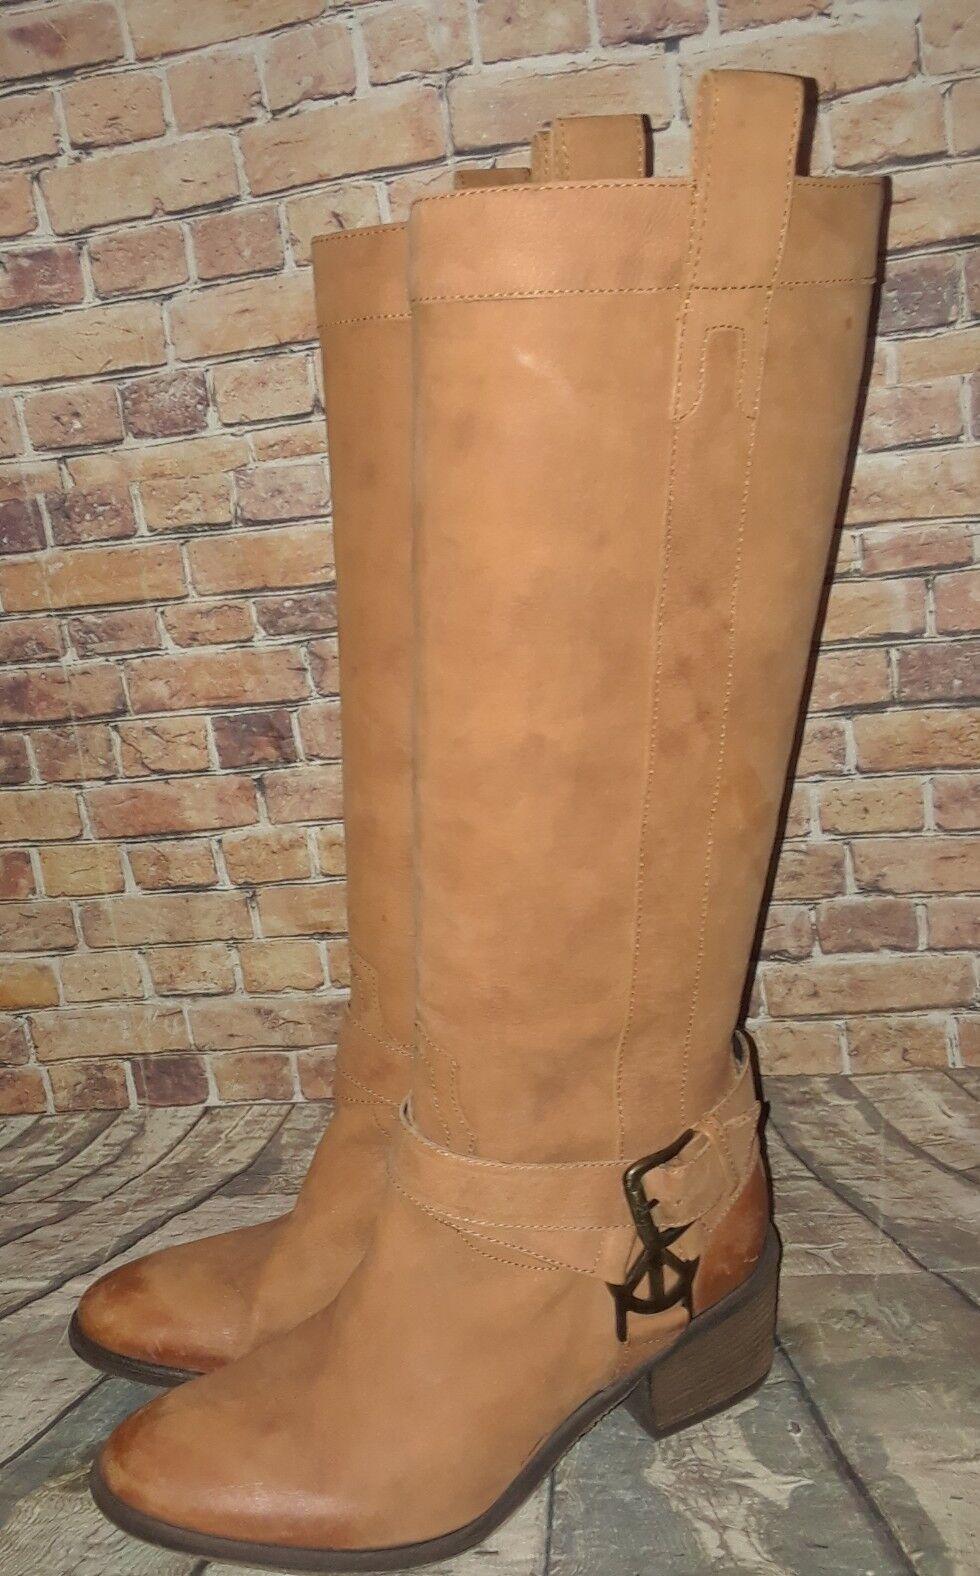 Donald J Pliner Cognac Braun Stiefel Leder Western Couture Pull-On Stiefel Braun 8.5M 'Devina' 768585